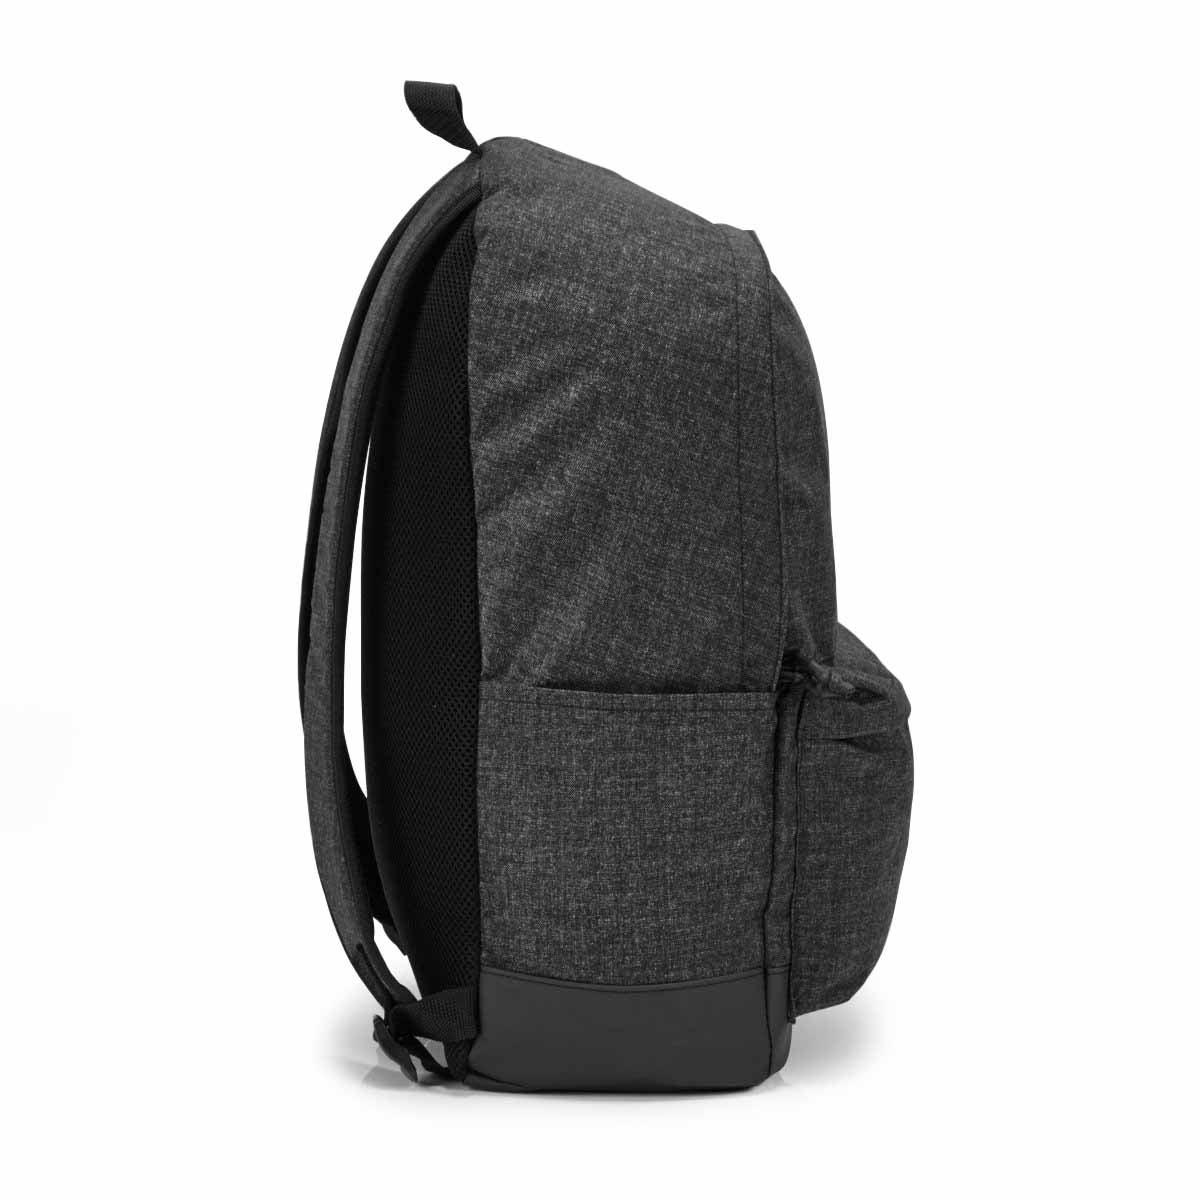 Adidas Classic BP FA2 bk/bk/wt backpack